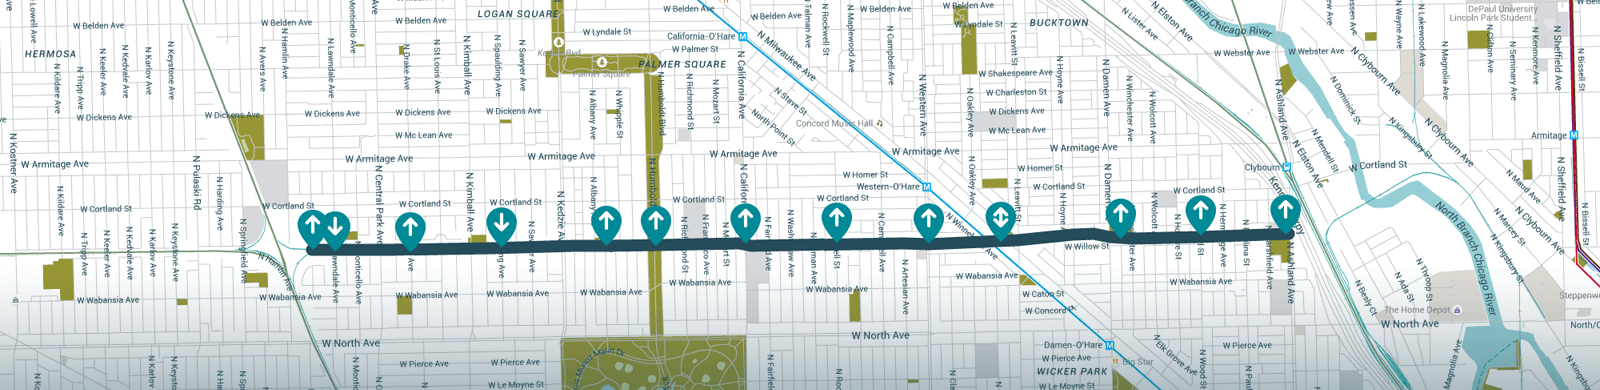 606 Trail Map